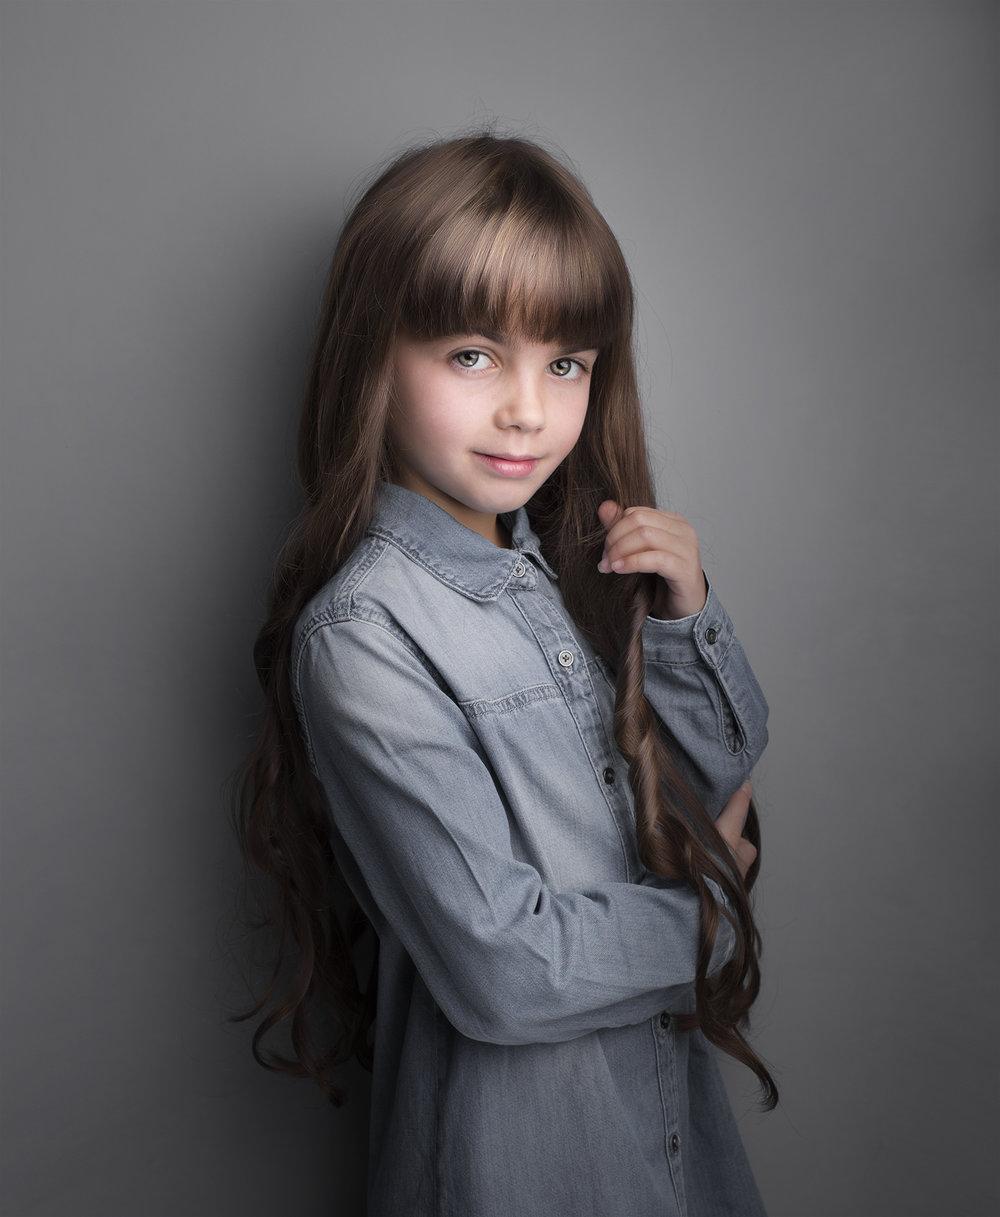 elizabethgphotography_fineart_kingslangley_london_hertfordshire_portrait_childrens_chloe_3.jpg